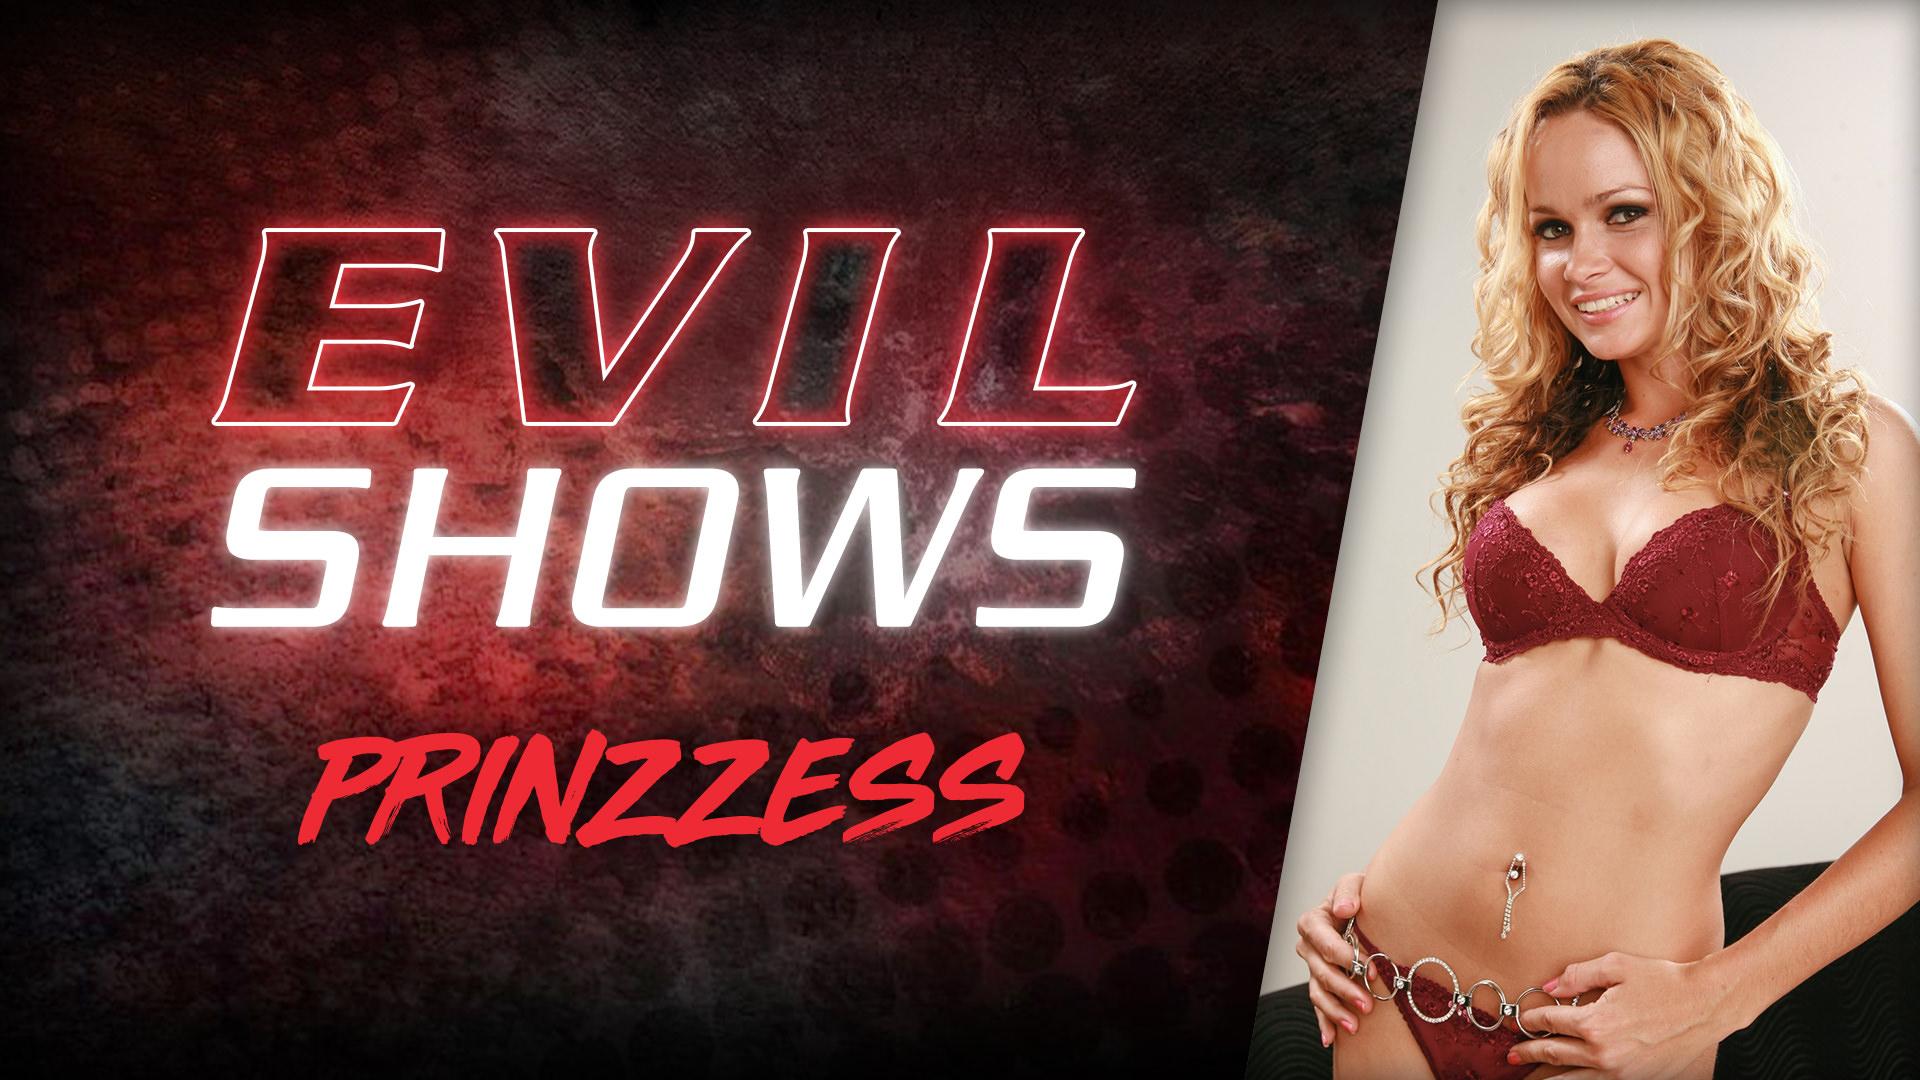 Evil Shows - Prinzzess - Prinzzess 1